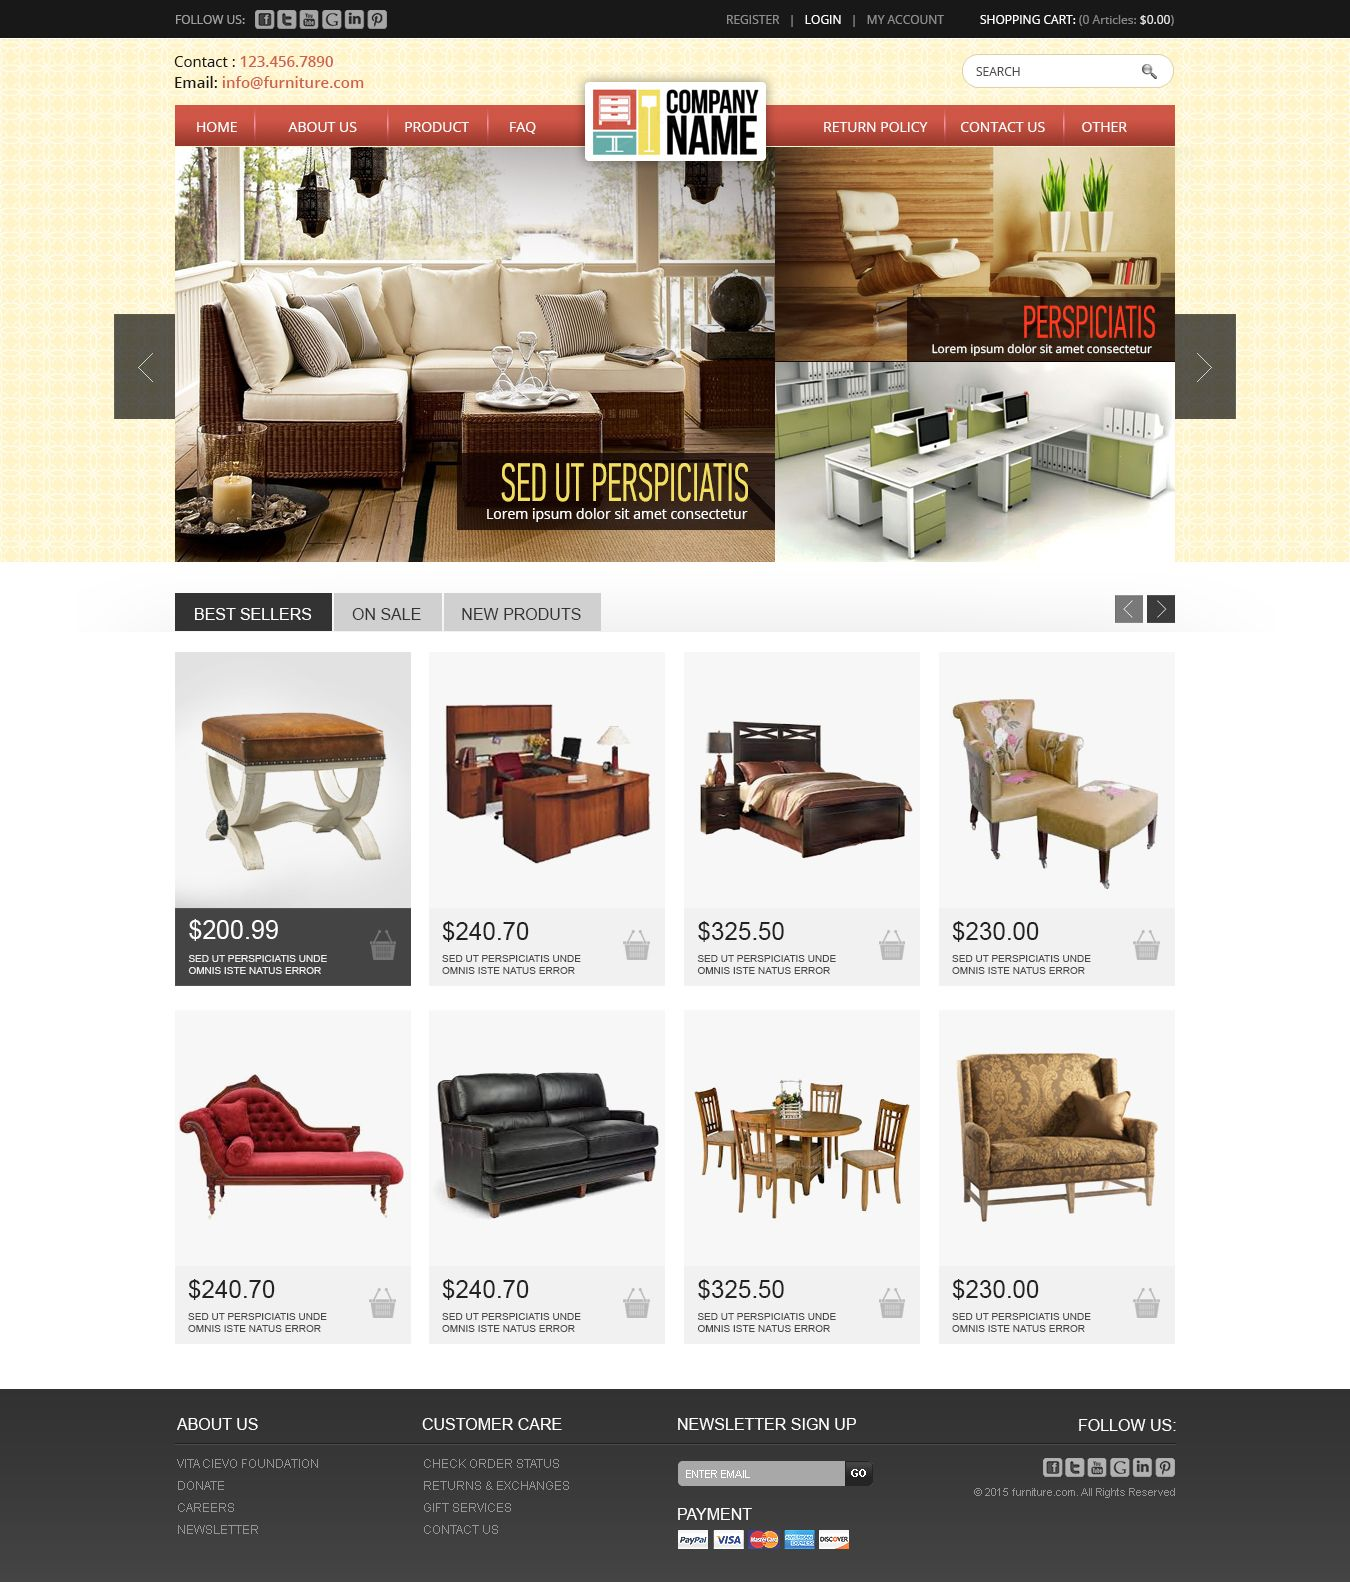 E Commerce Website Of Furniure Furniure Home Best Sellers